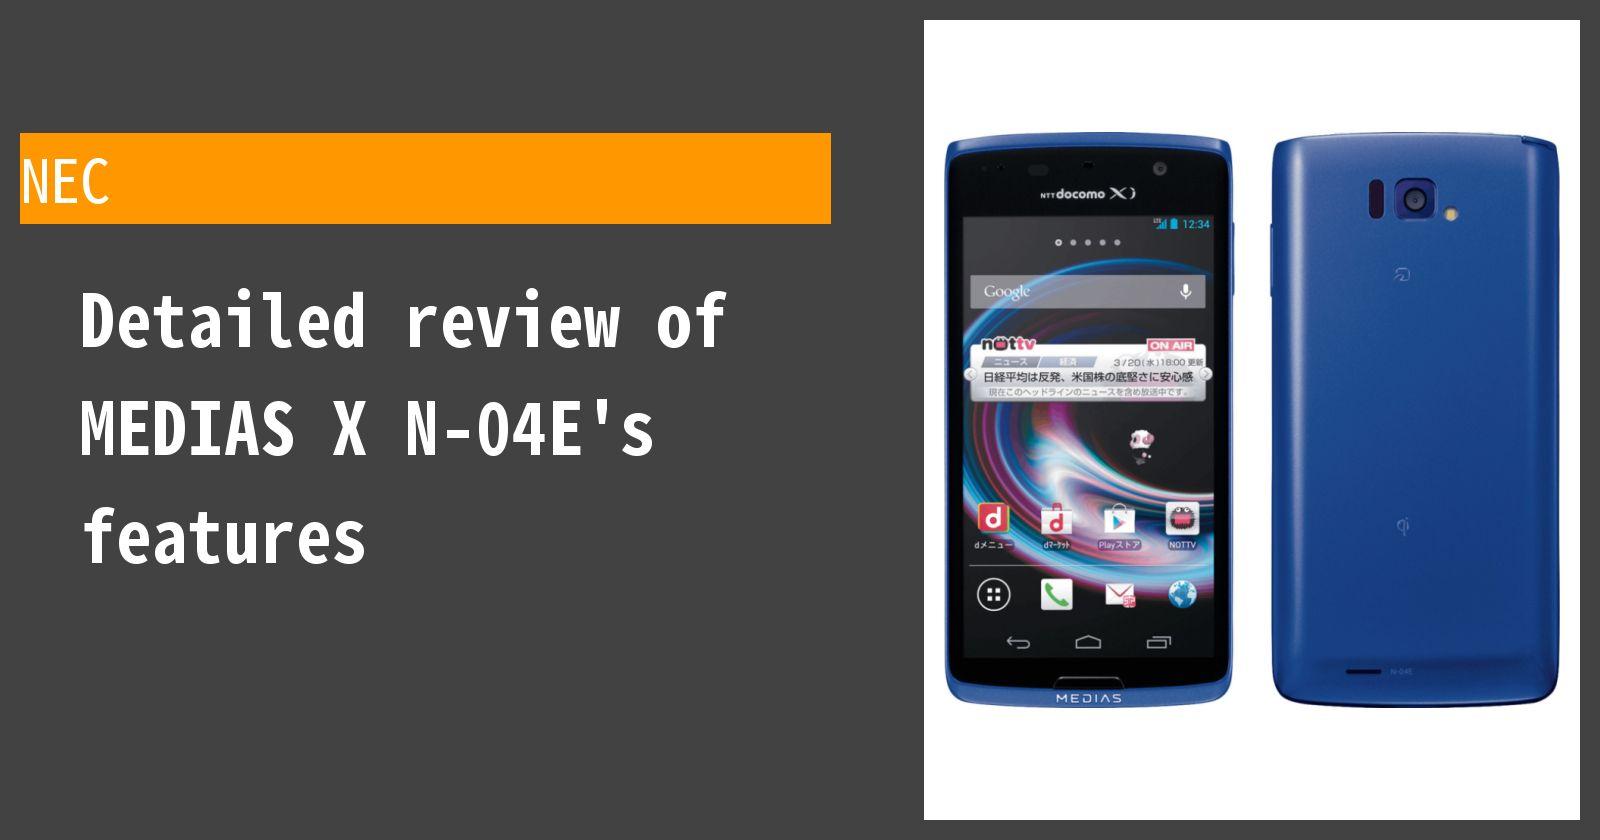 Detailed review of MEDIAS X N-04E docomo's features